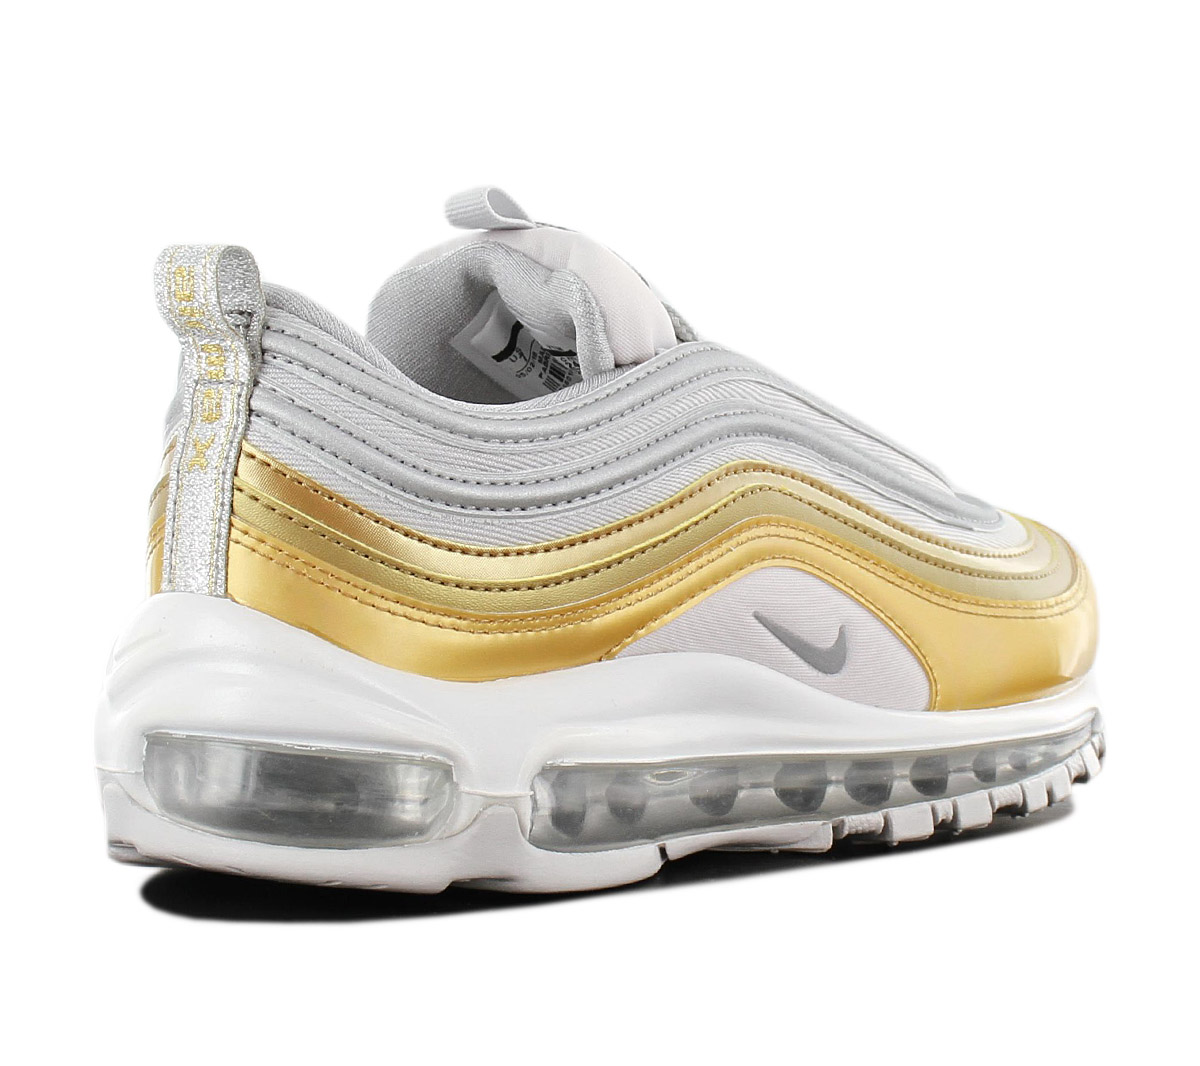 d81cc2ca1ba98f NEU Nike Air Max 97 SE Special Edition Damen Schuhe Silber-Gold ...